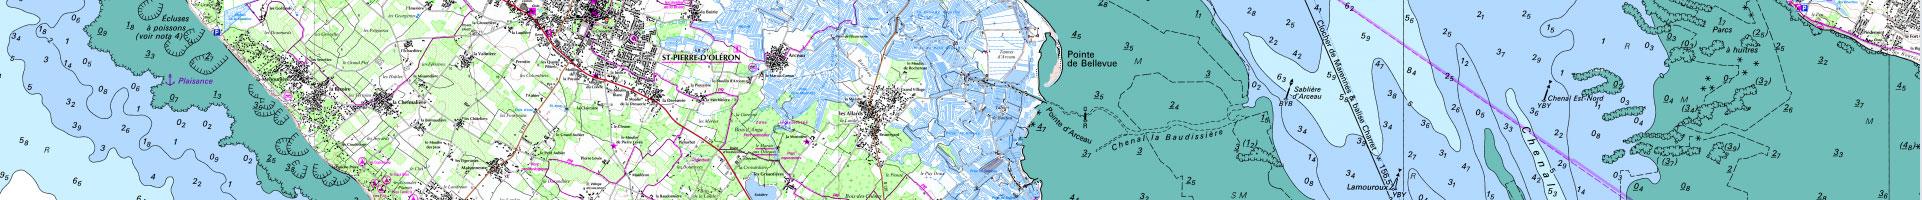 Carte littorale / SHOM / IGN 2e niveau d'agrandissement